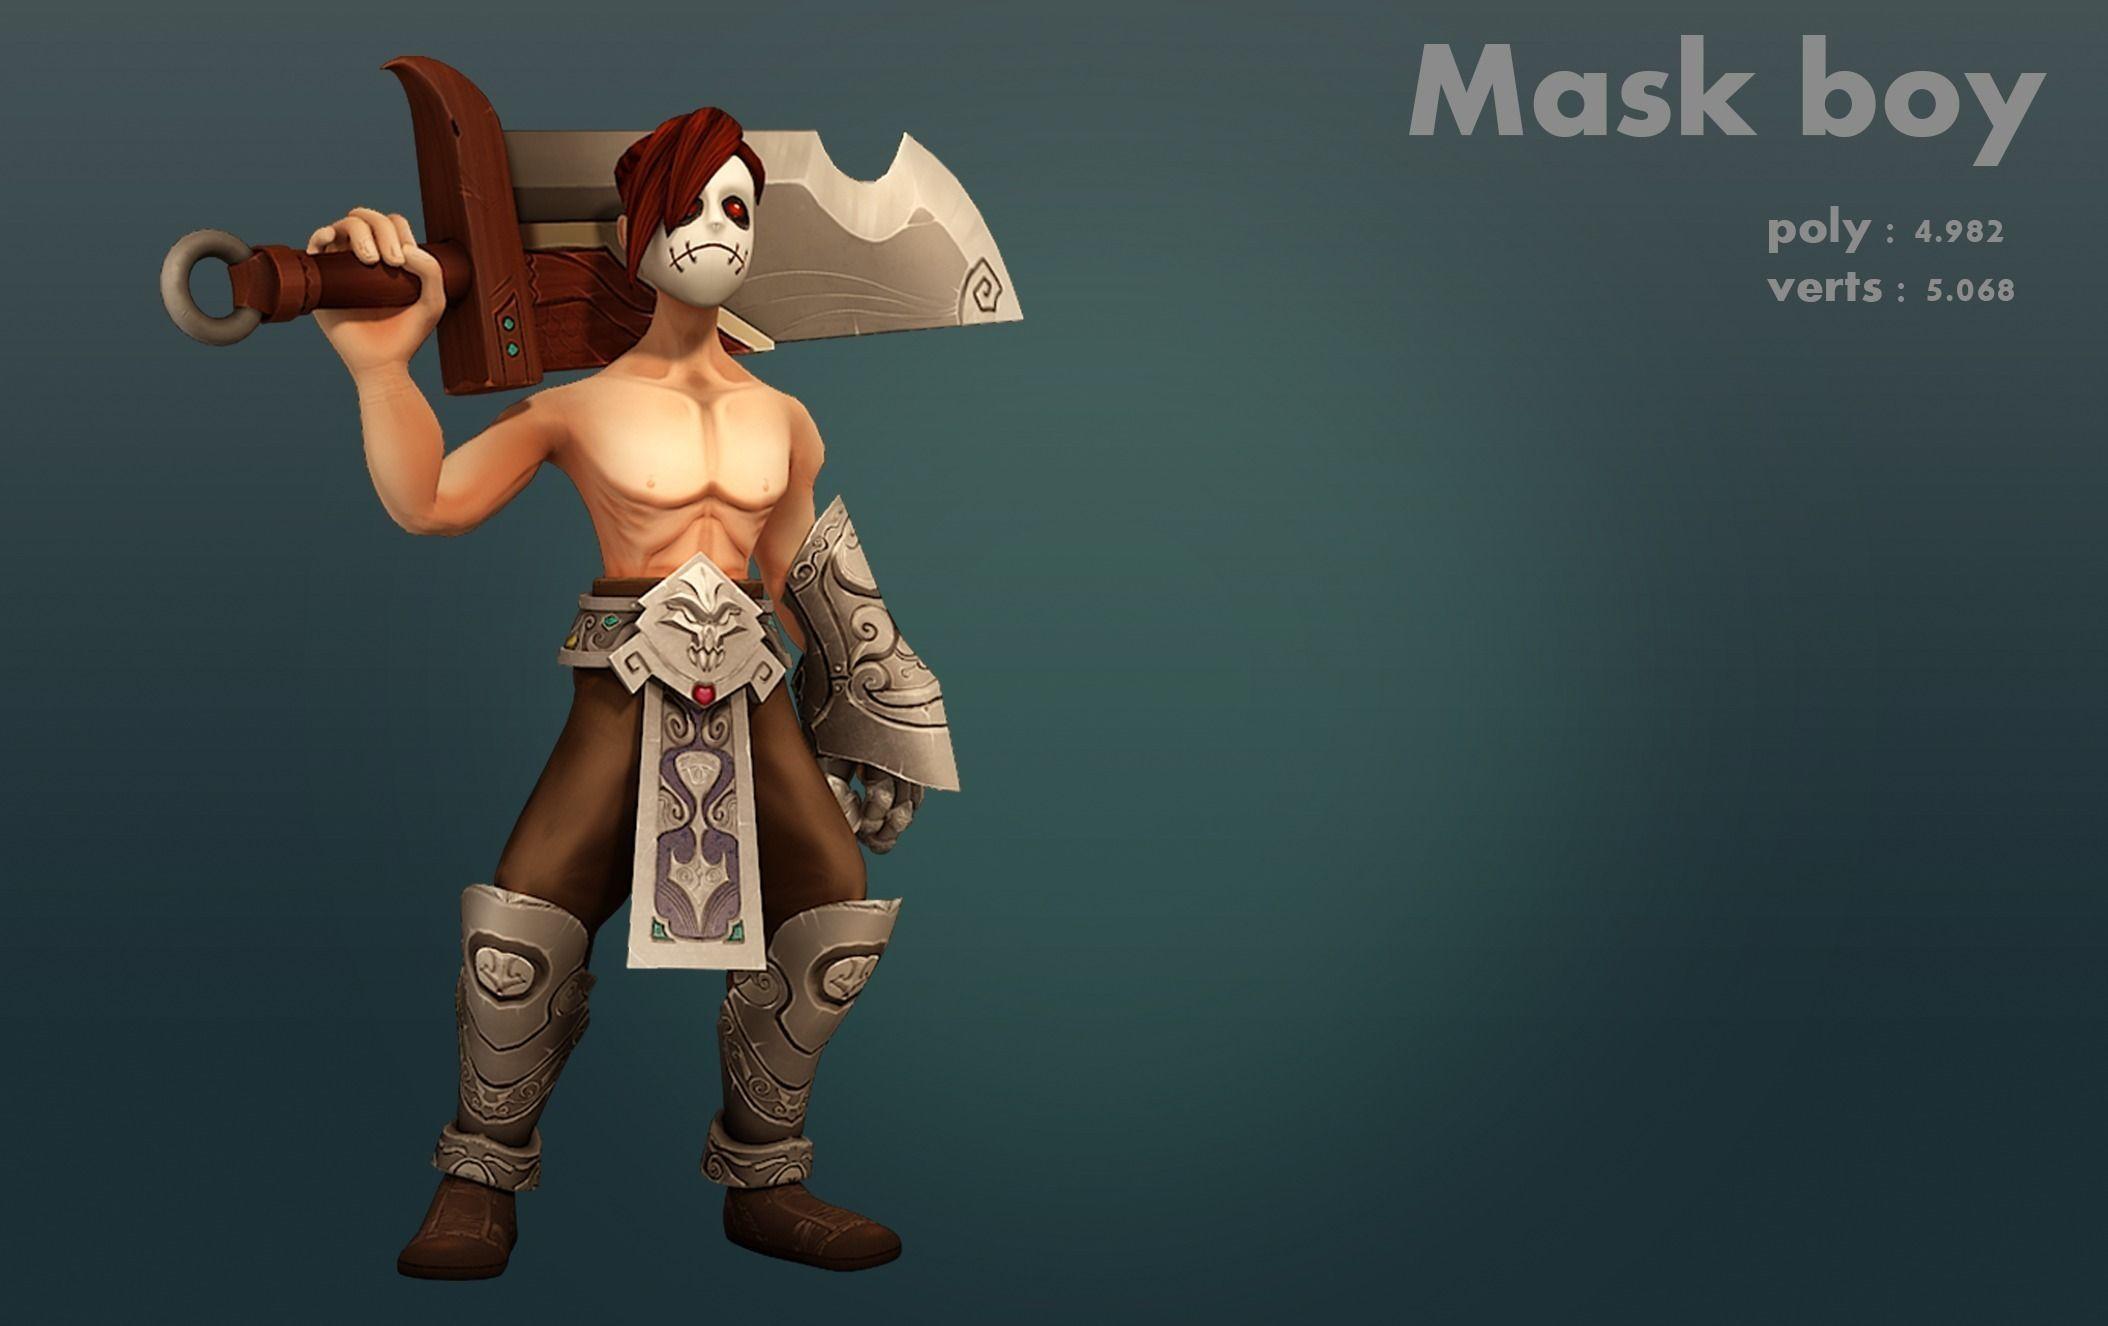 Mask boy